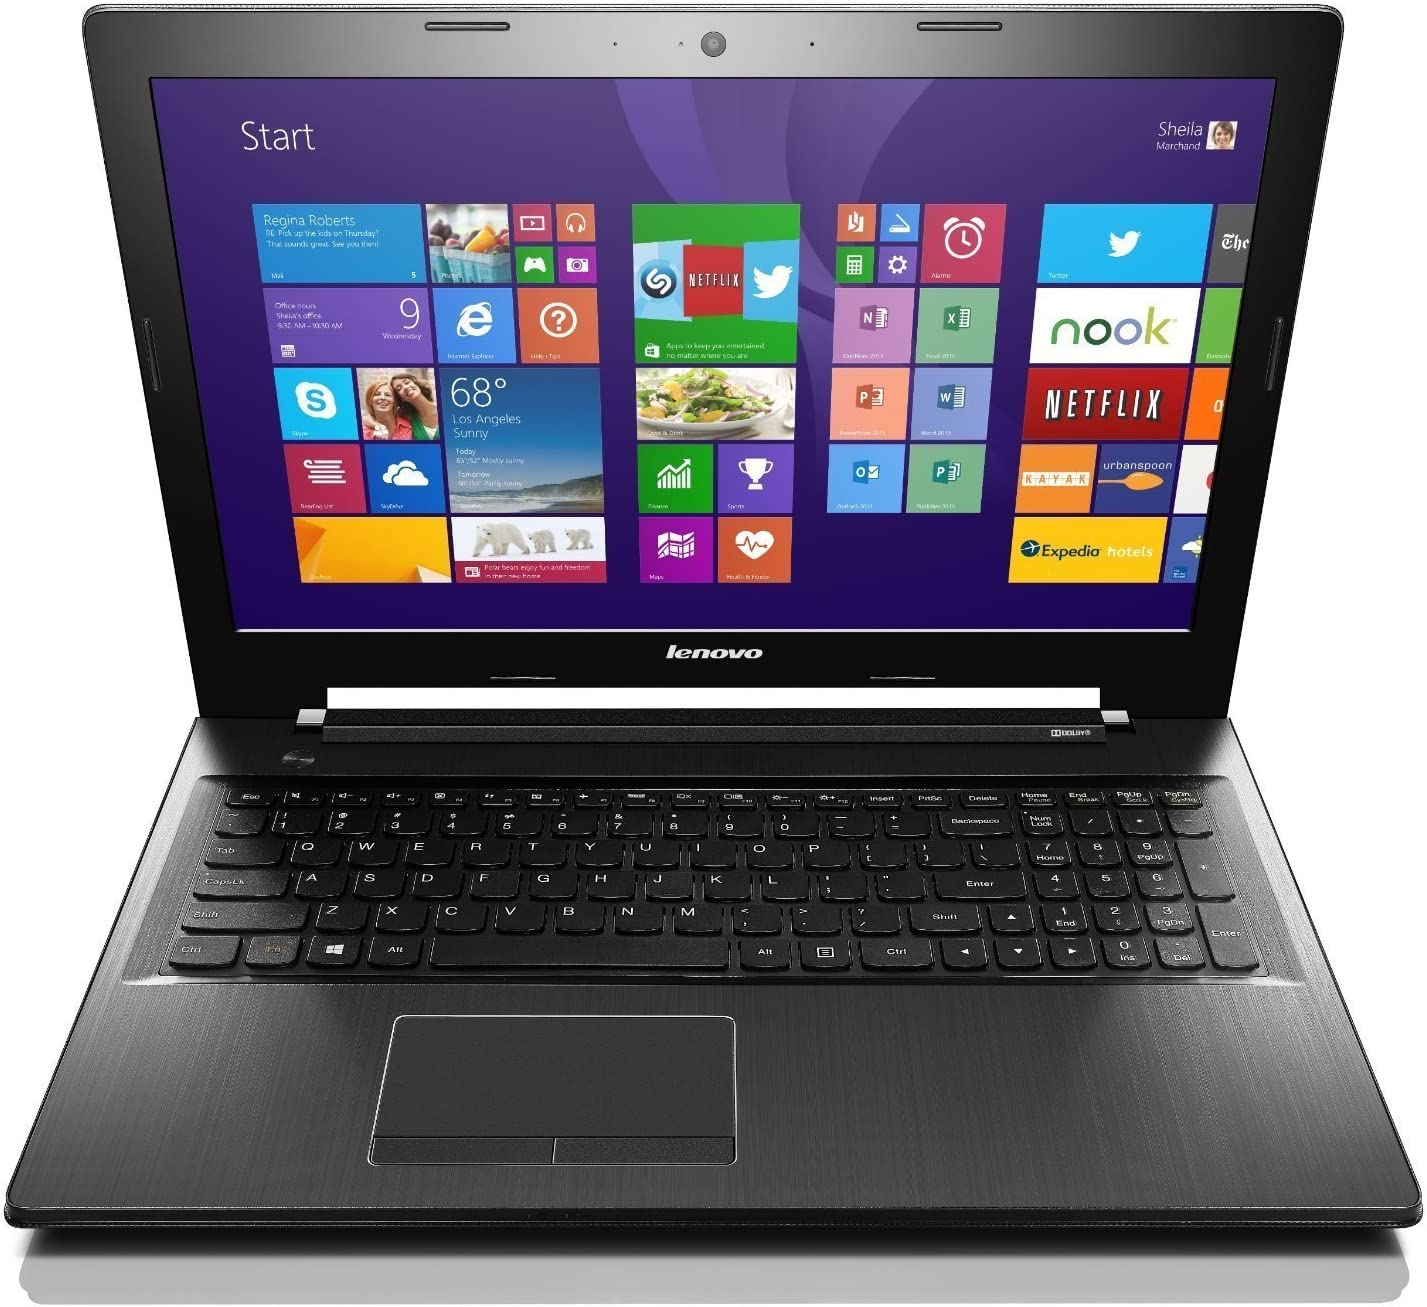 "Lenovo Z50-70 Laptop Computer - 59436278 - Core i7-4510U, 8GB RAM, 1TB HDD, 15.6"" Full HD 1080p Display, NVidia 820M 2GB Graphics (Renewed)"